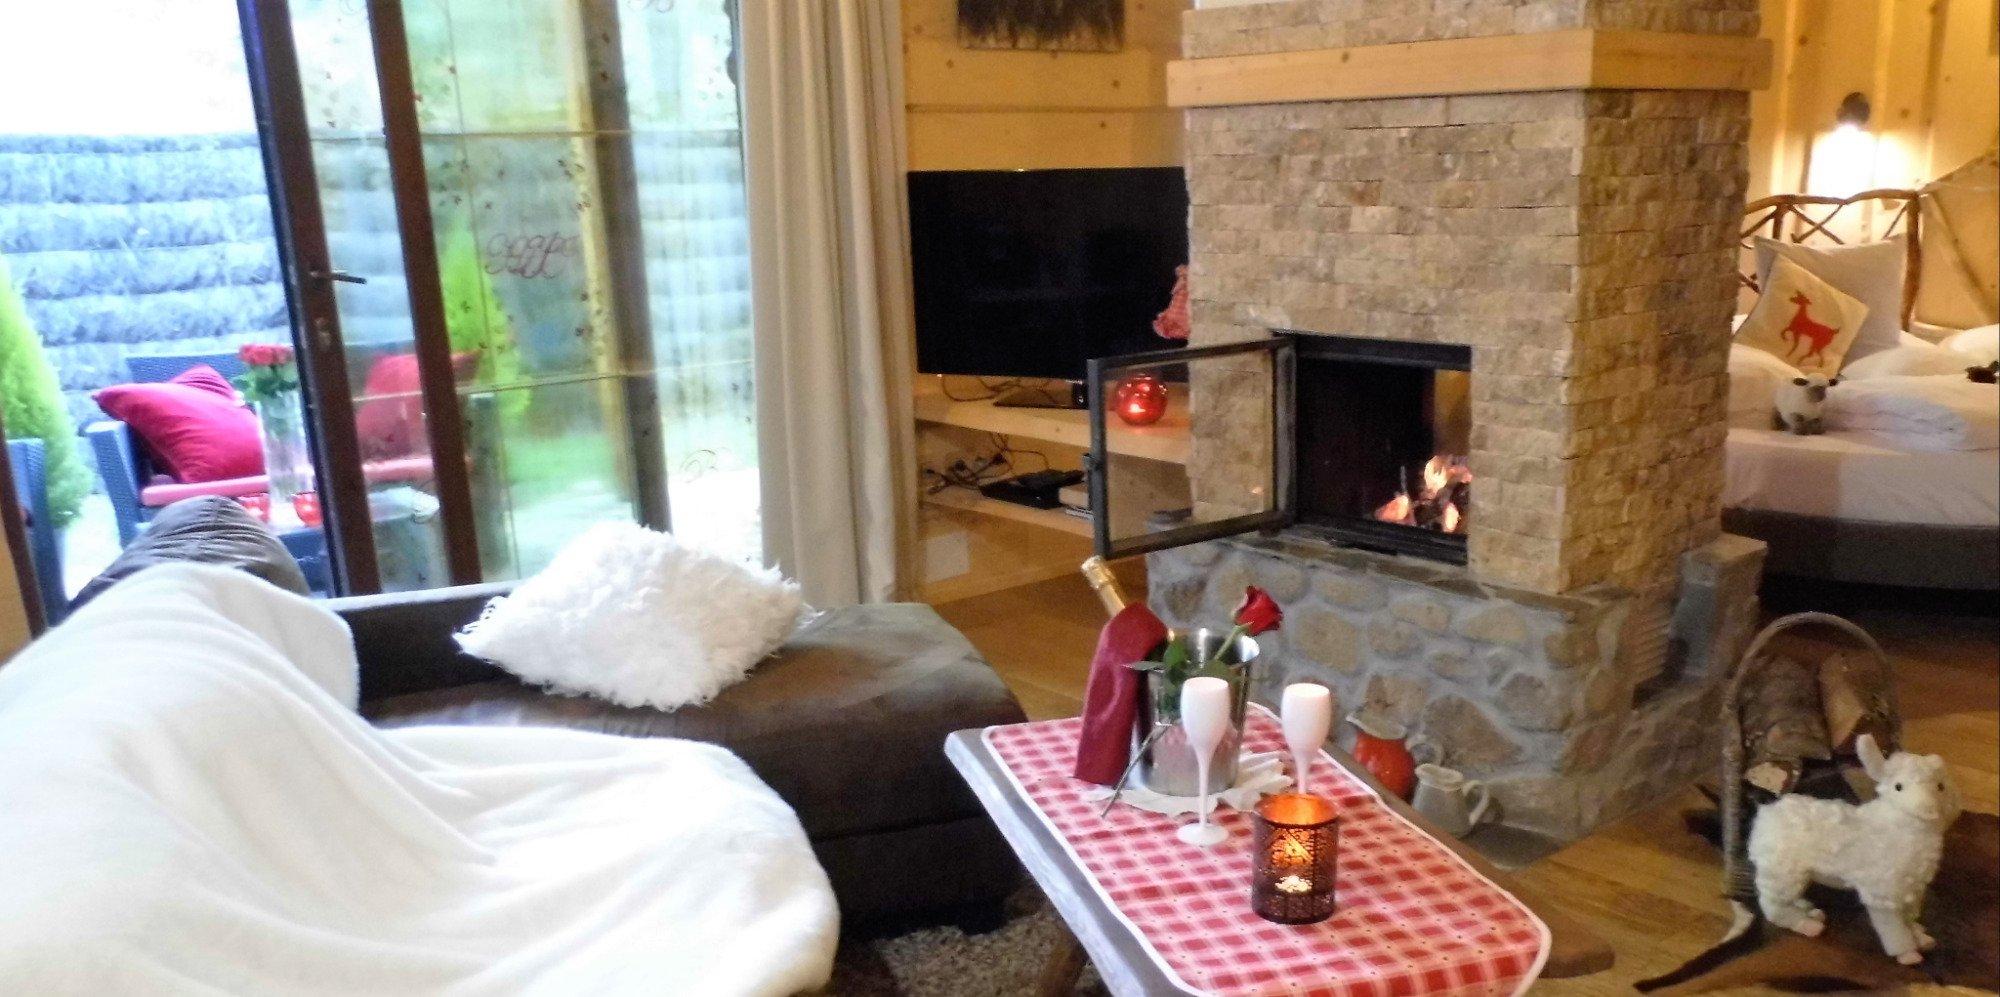 Domaine du Haut Jardin UPDATED 2017 Hotel Reviews & Price